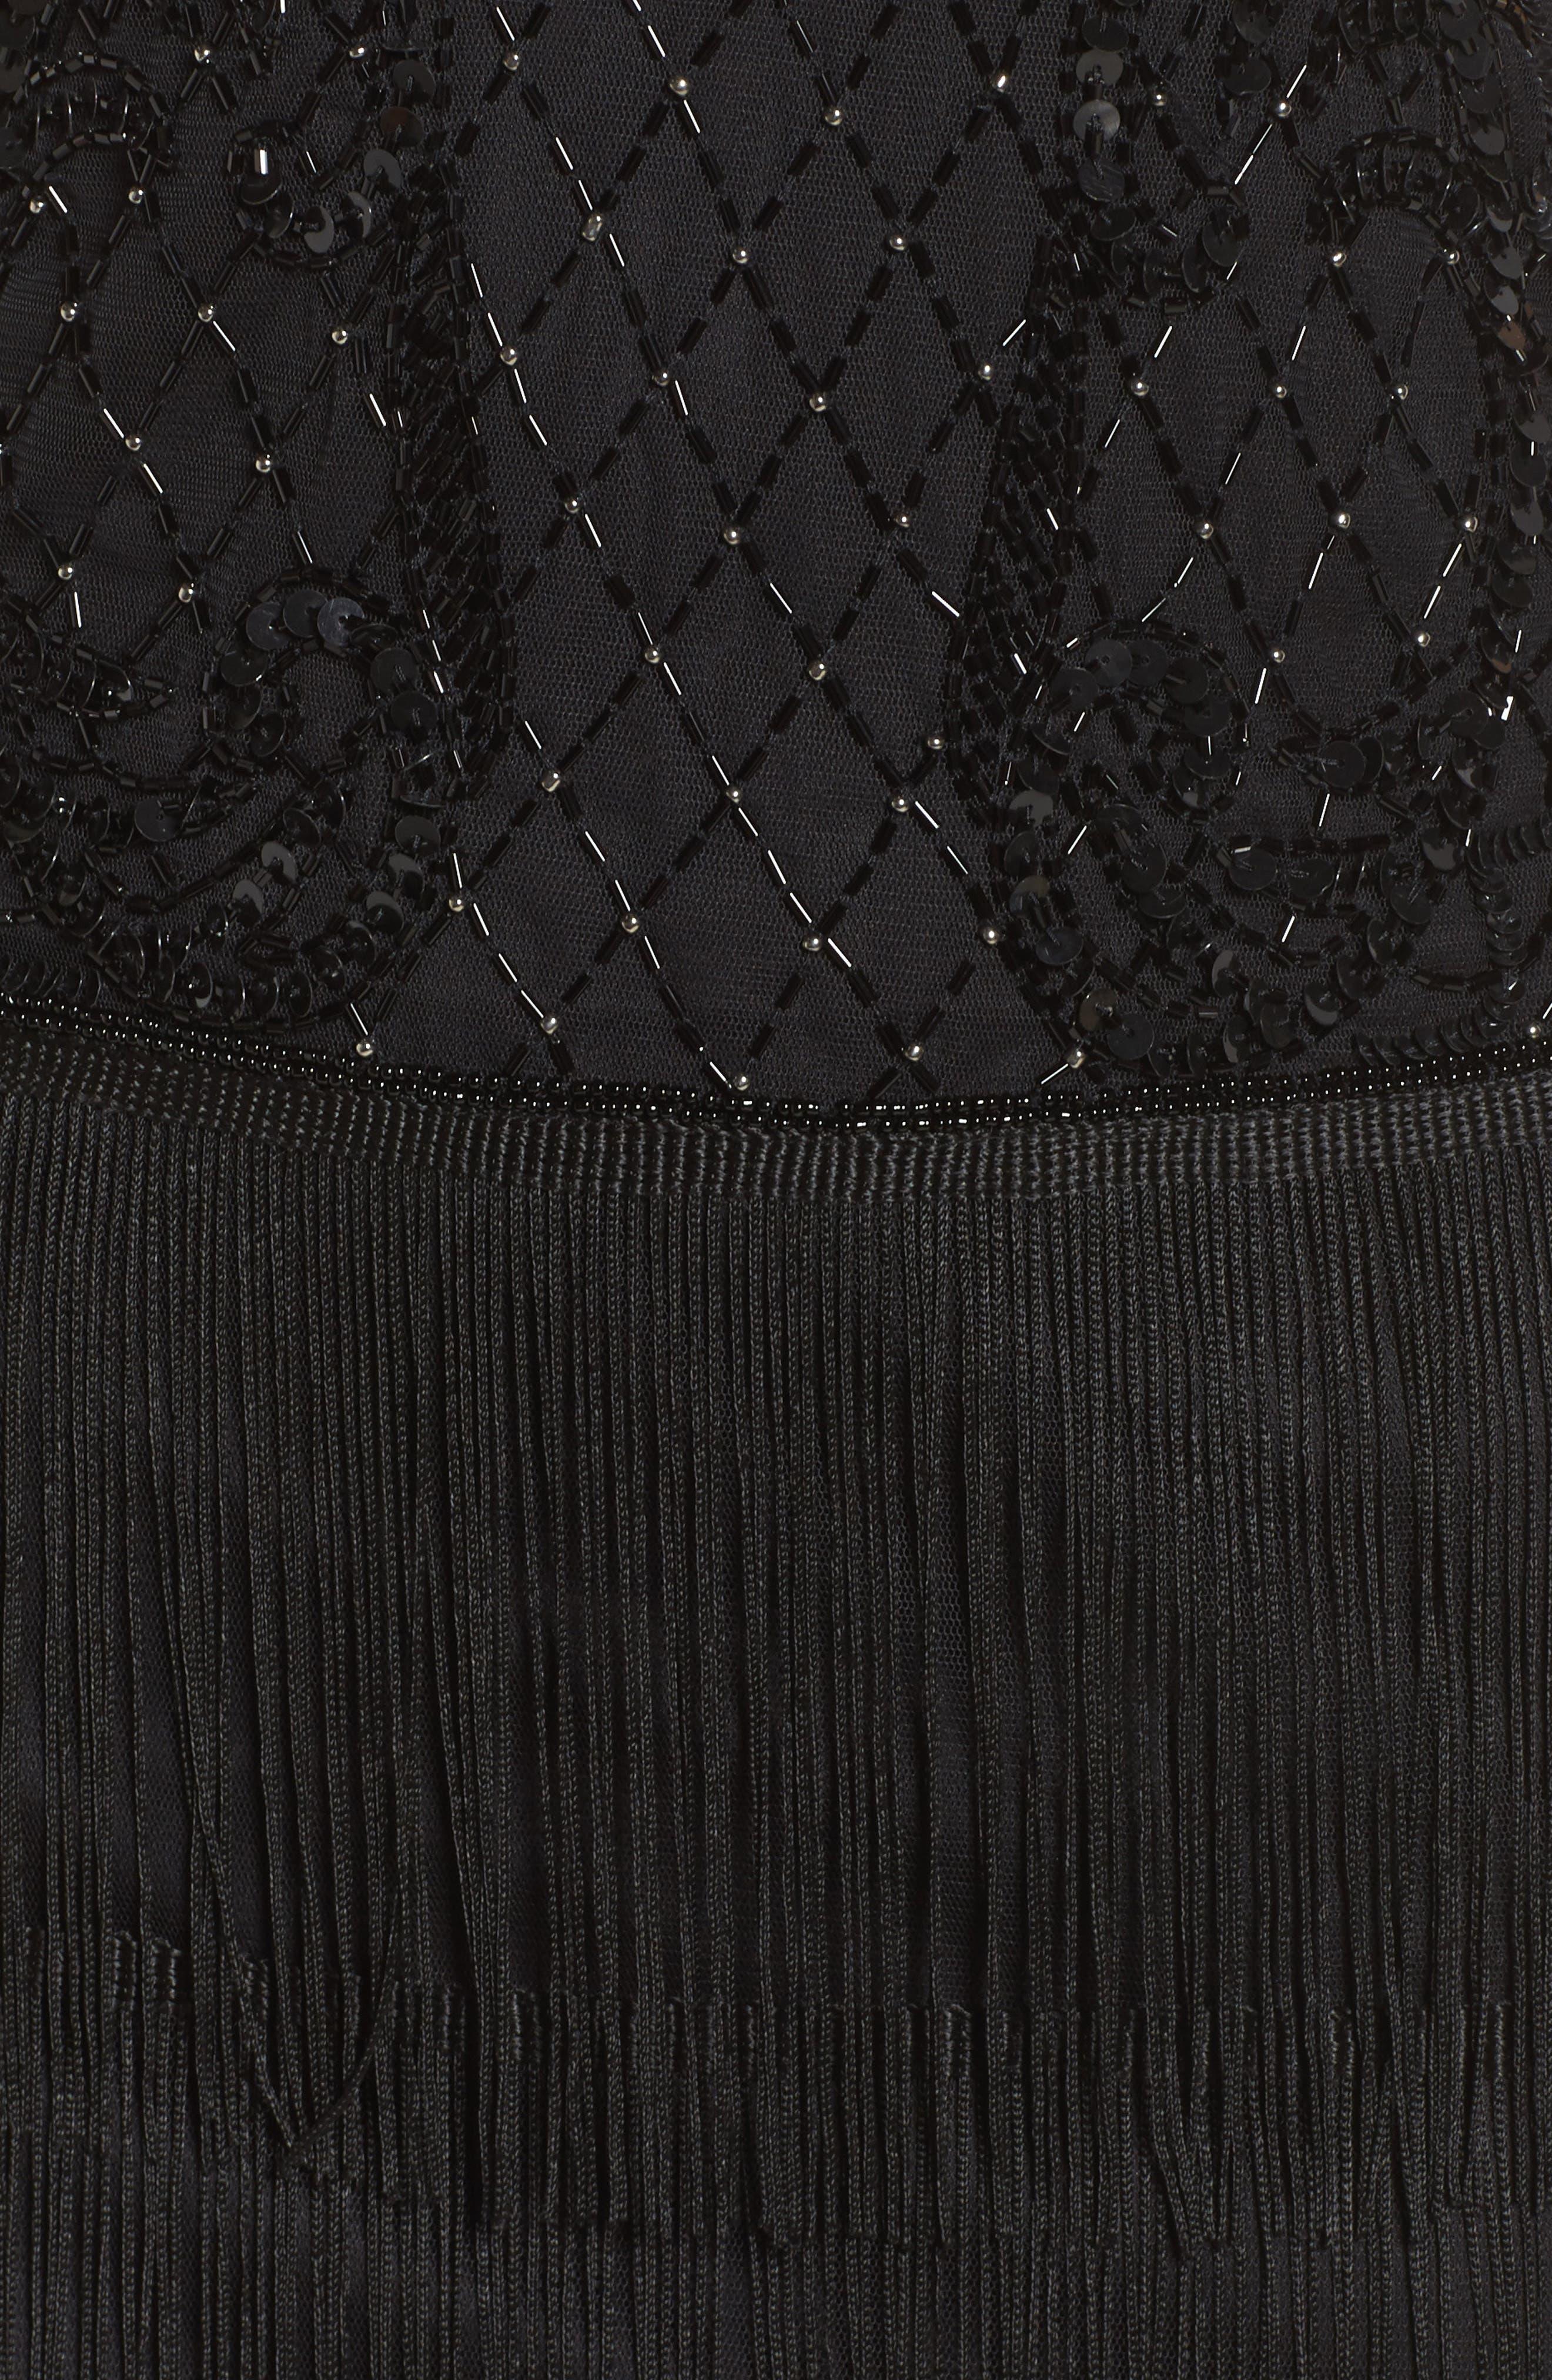 Embellished Fringe Tiered Sheath Dress,                             Alternate thumbnail 5, color,                             001